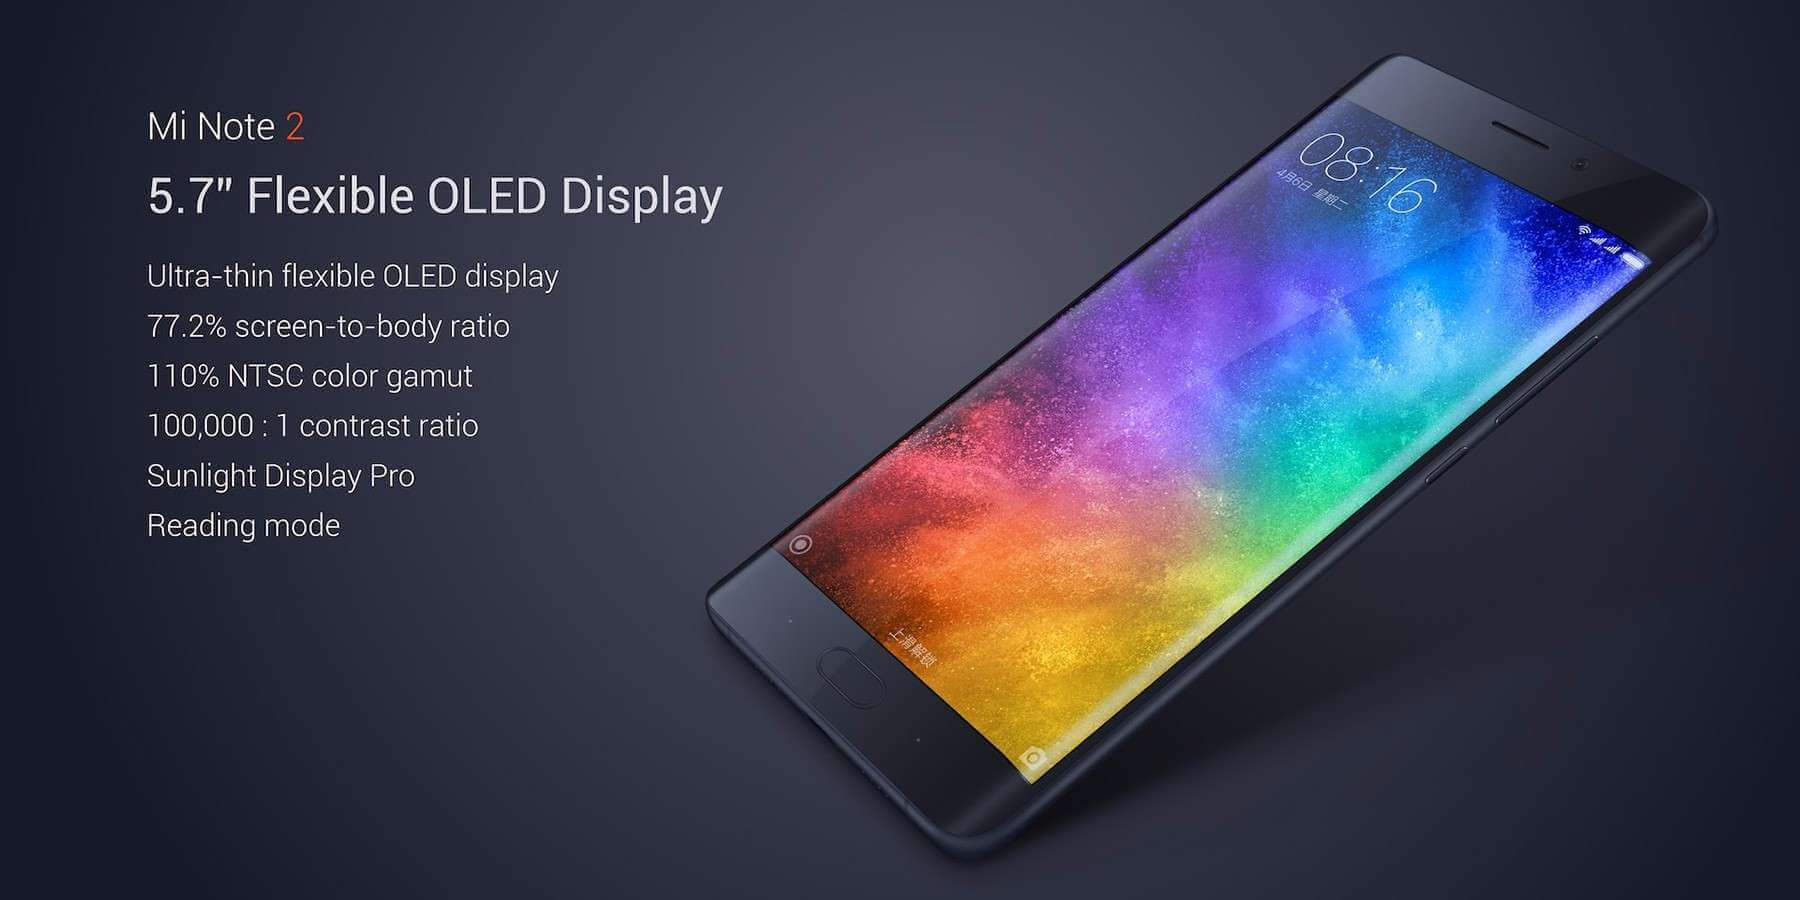 display-xiaomi-mi-note-2-4g-phablet_1